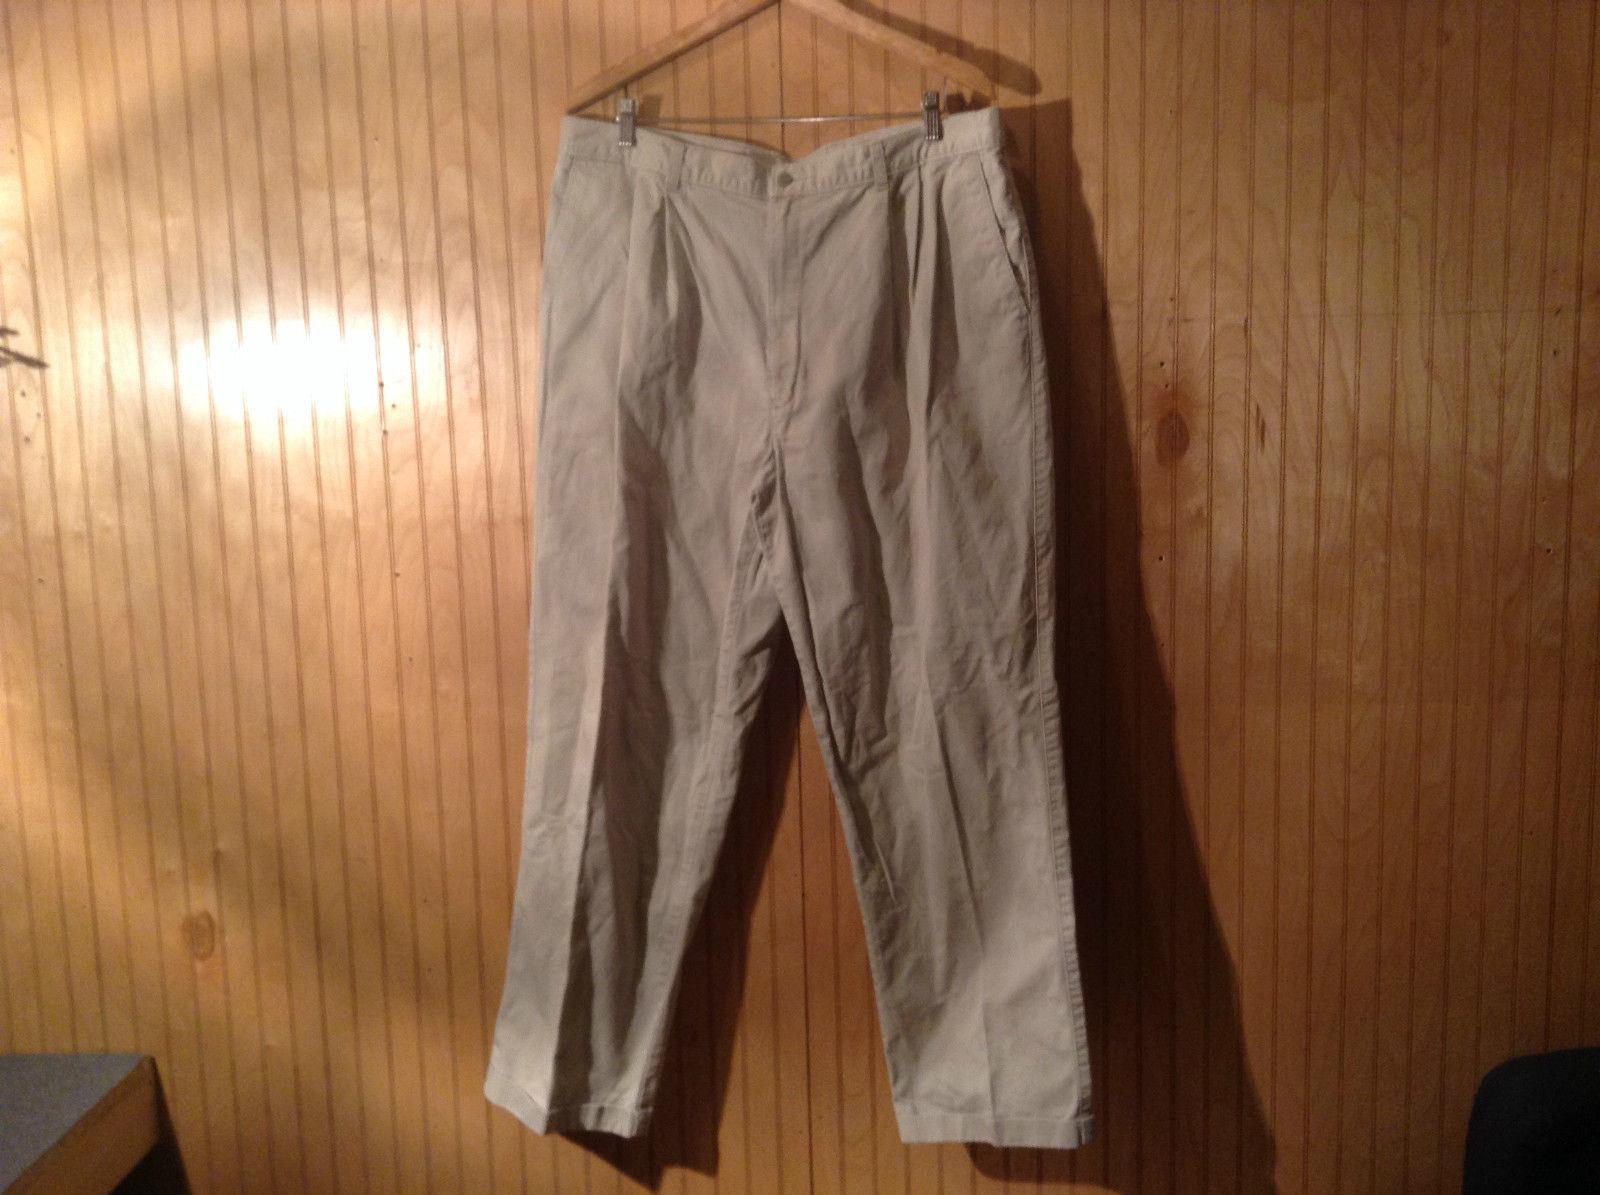 Dockers Classic Khakis Casual Pants Zipper Button Closure Size W40 by L32